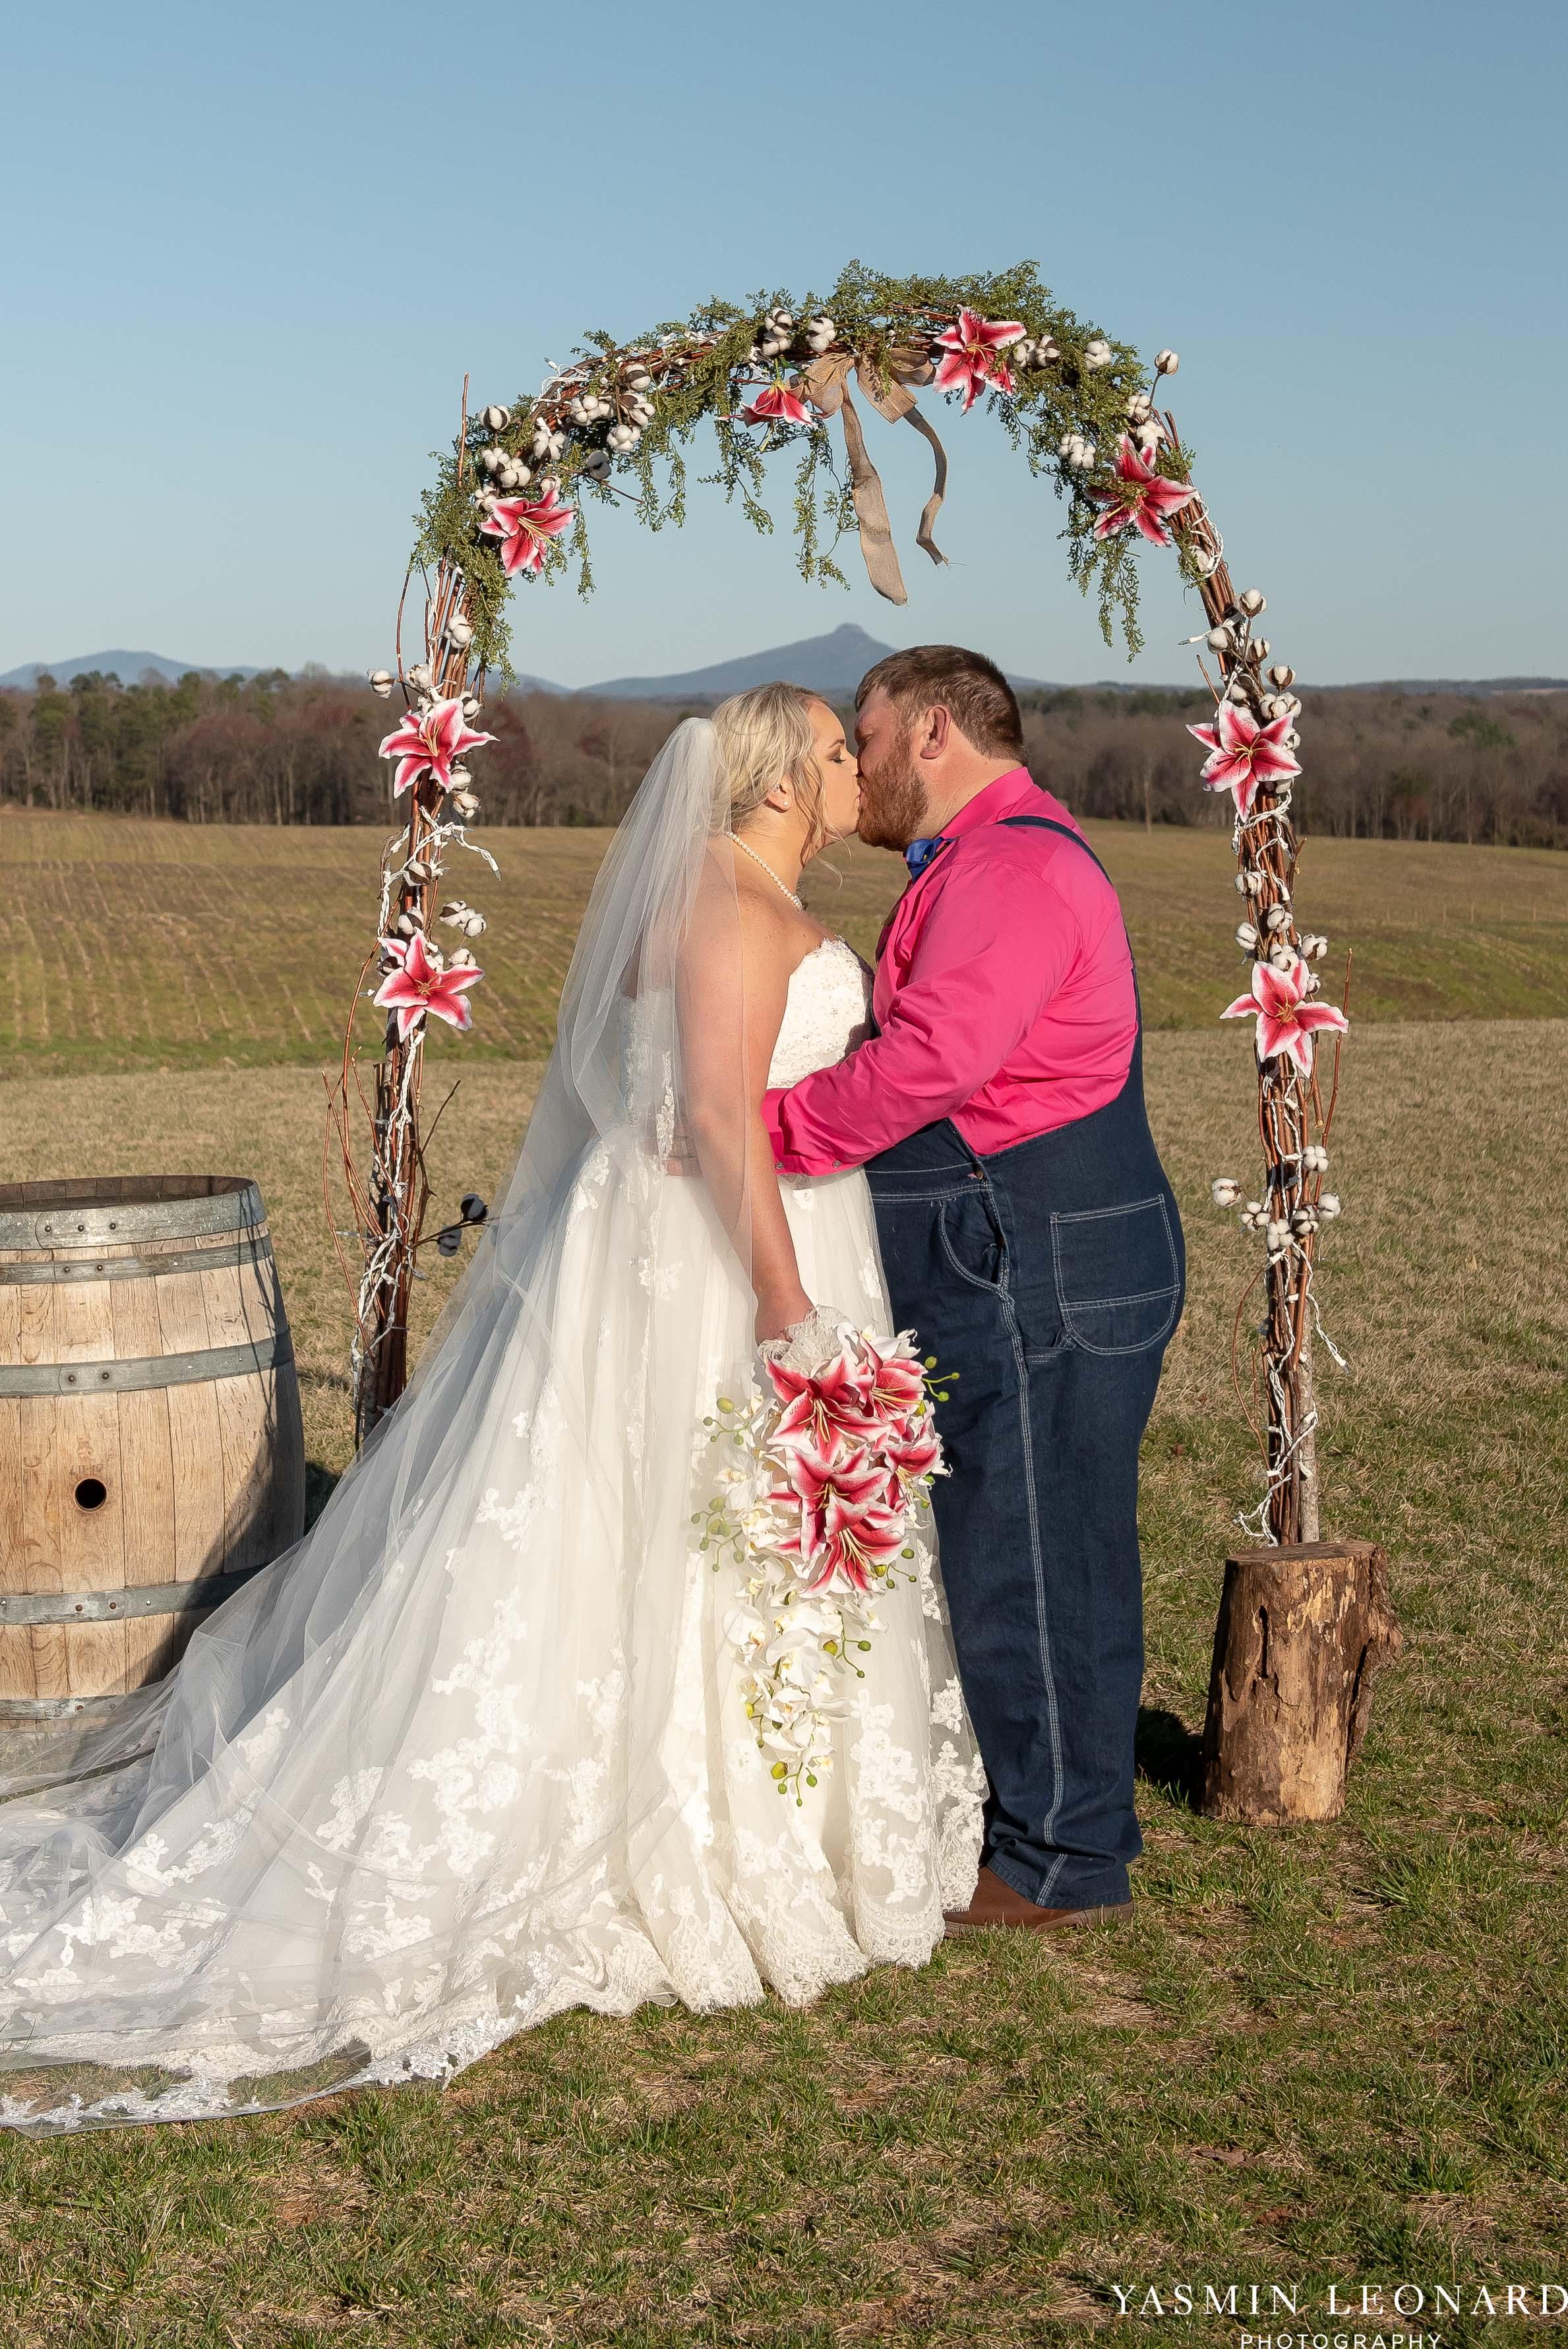 The Barn at Heritage Farm - Country Wedding - Pink and Blue Wedding - Barn Wedding - Outdoor Wedding - Cotton and Wheat Decor - Groom in Bibs - Pink Bridal Colors - Yasmin Leonard Photography-15.jpg